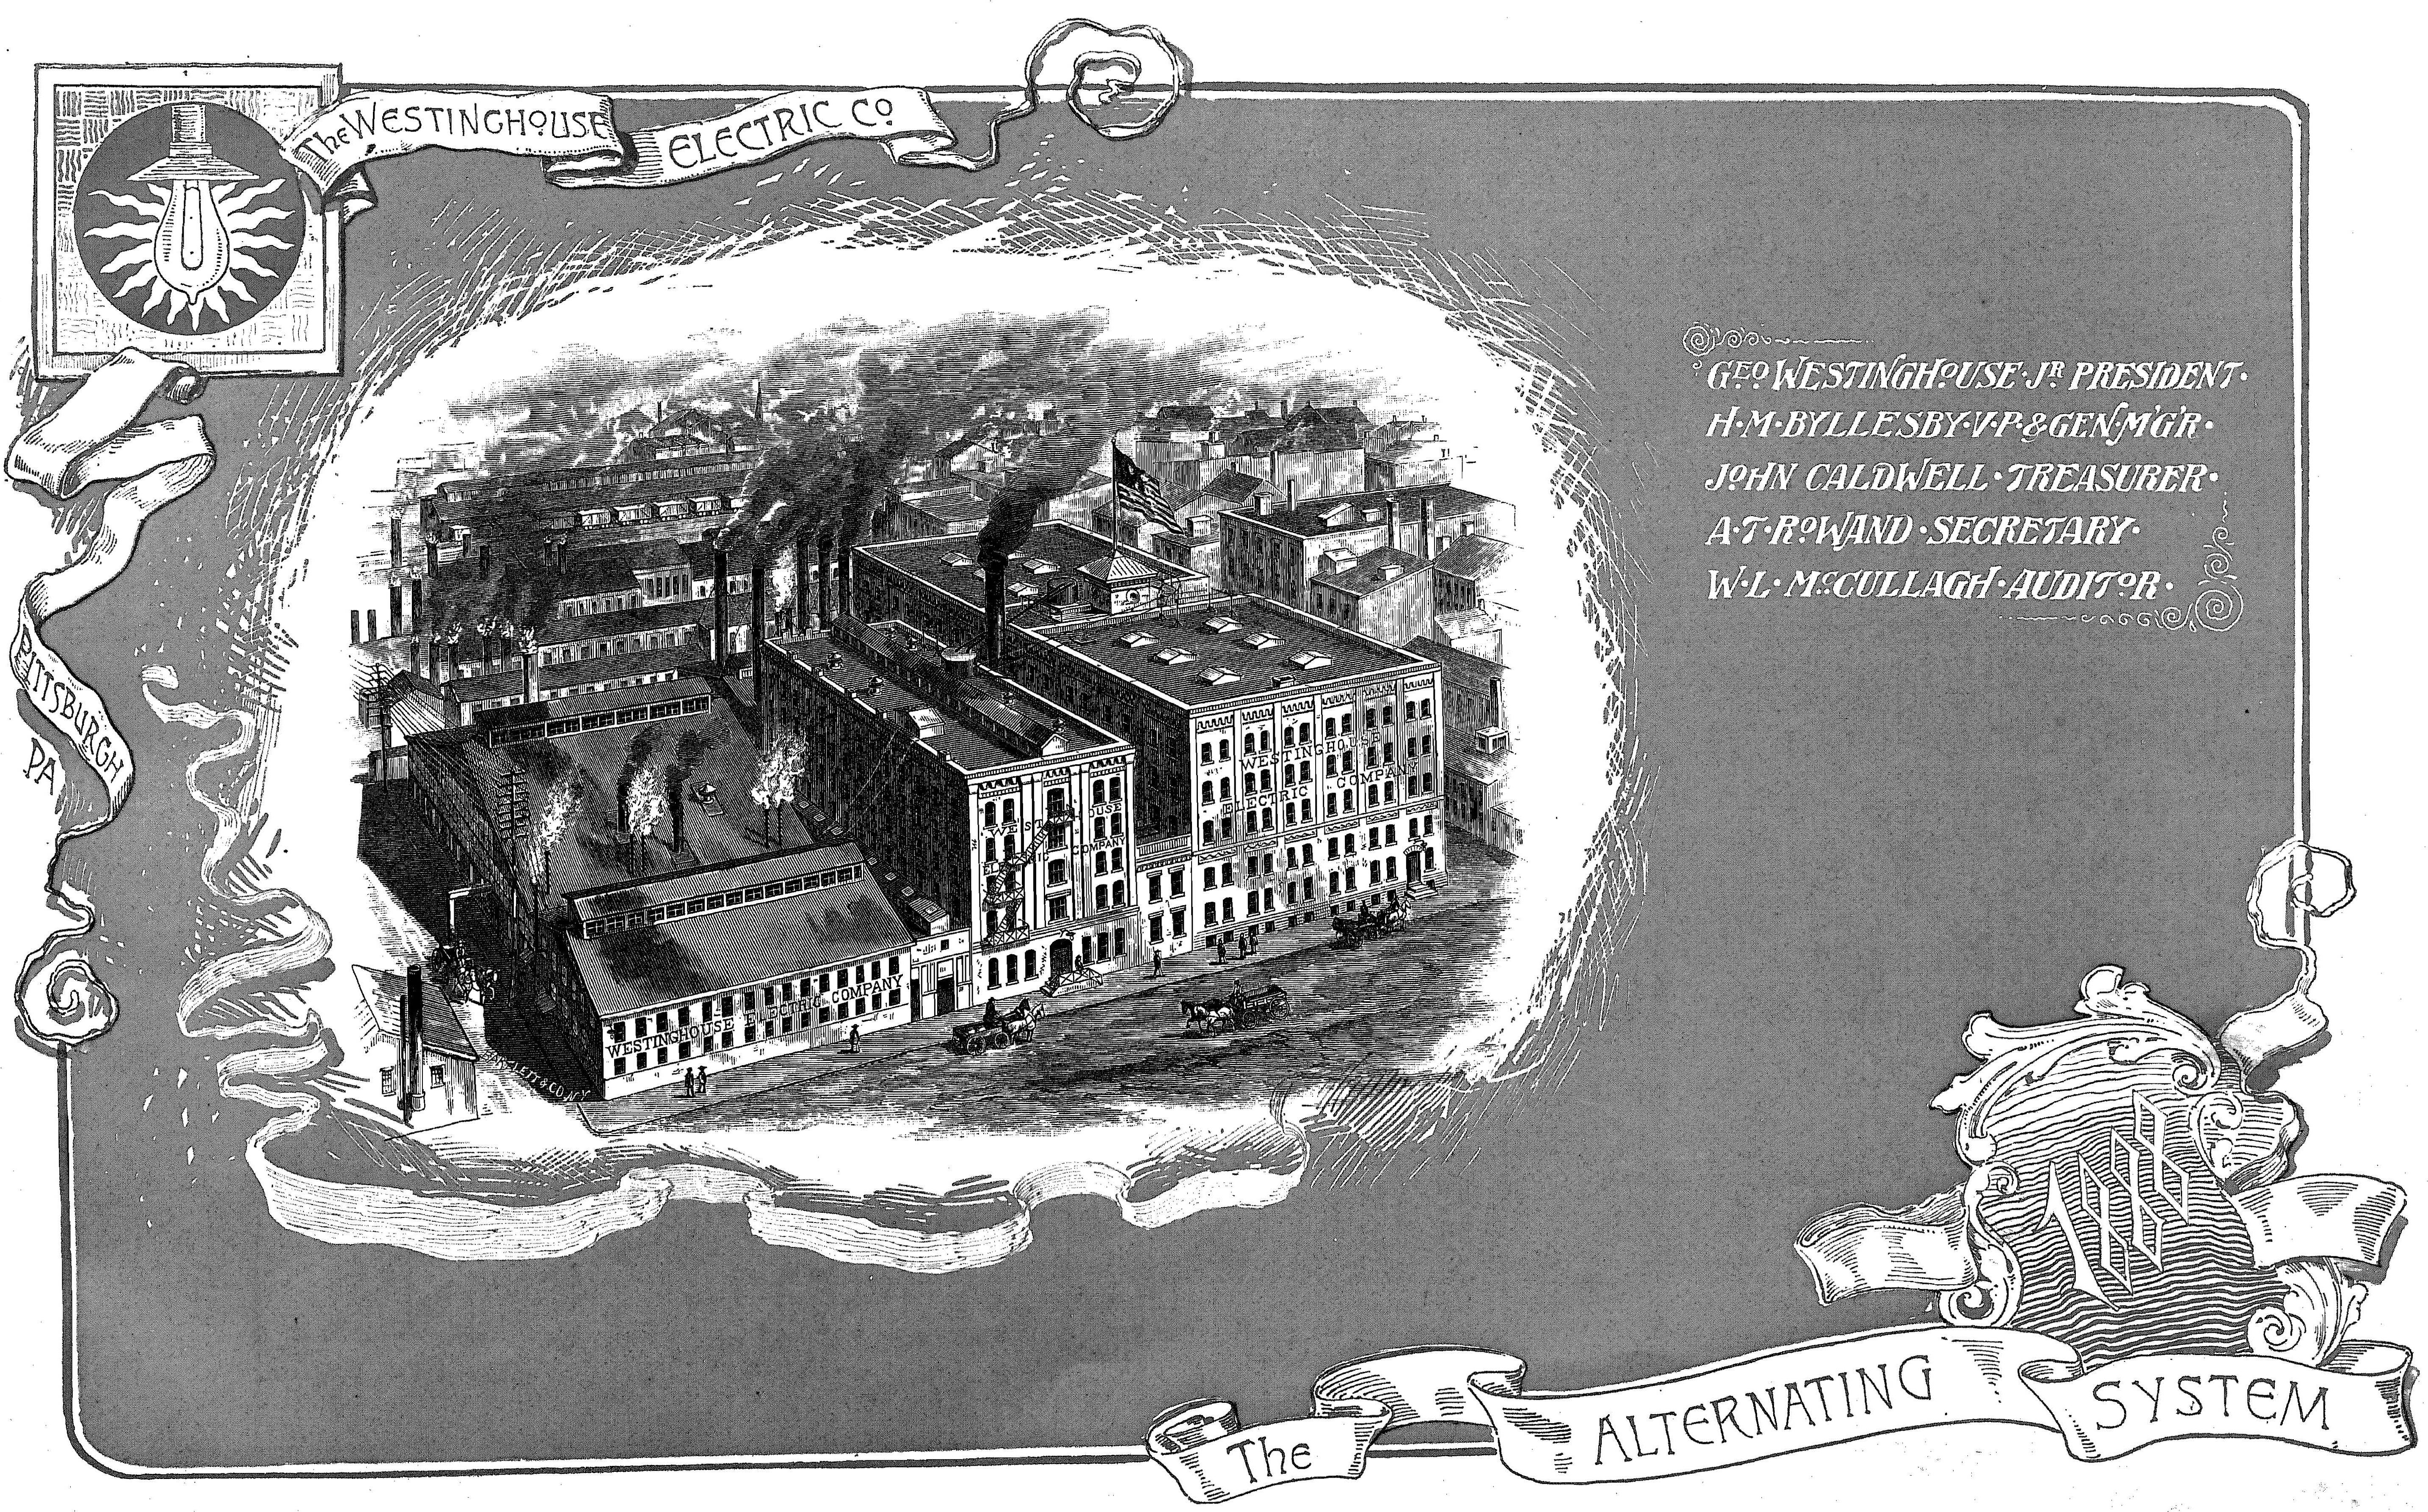 Empresa Westinghouse